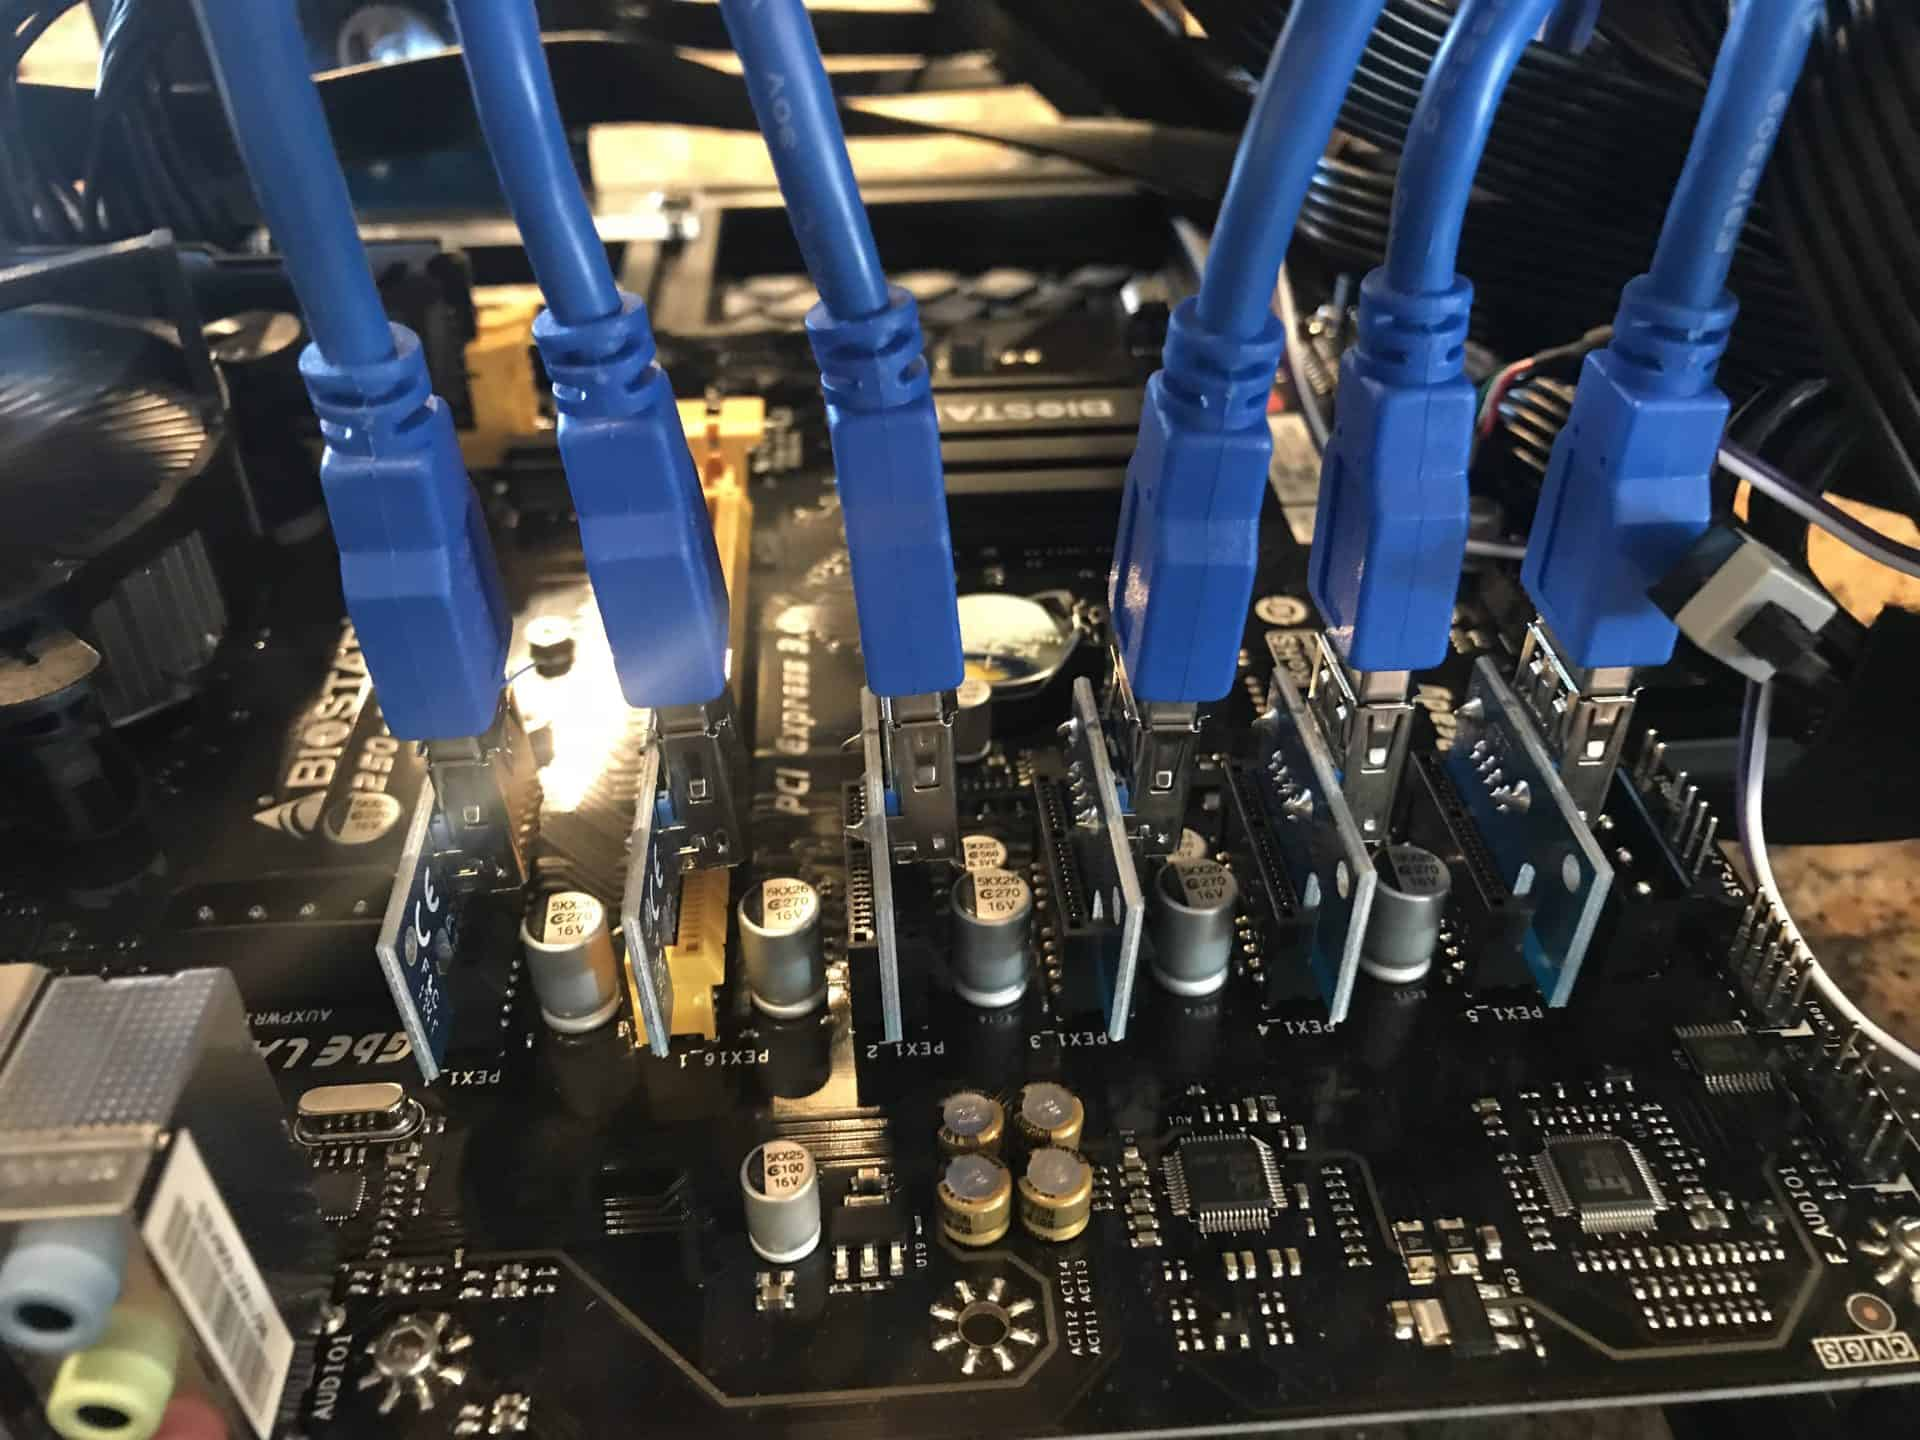 Overclocking a Mining GPU with USB Risers